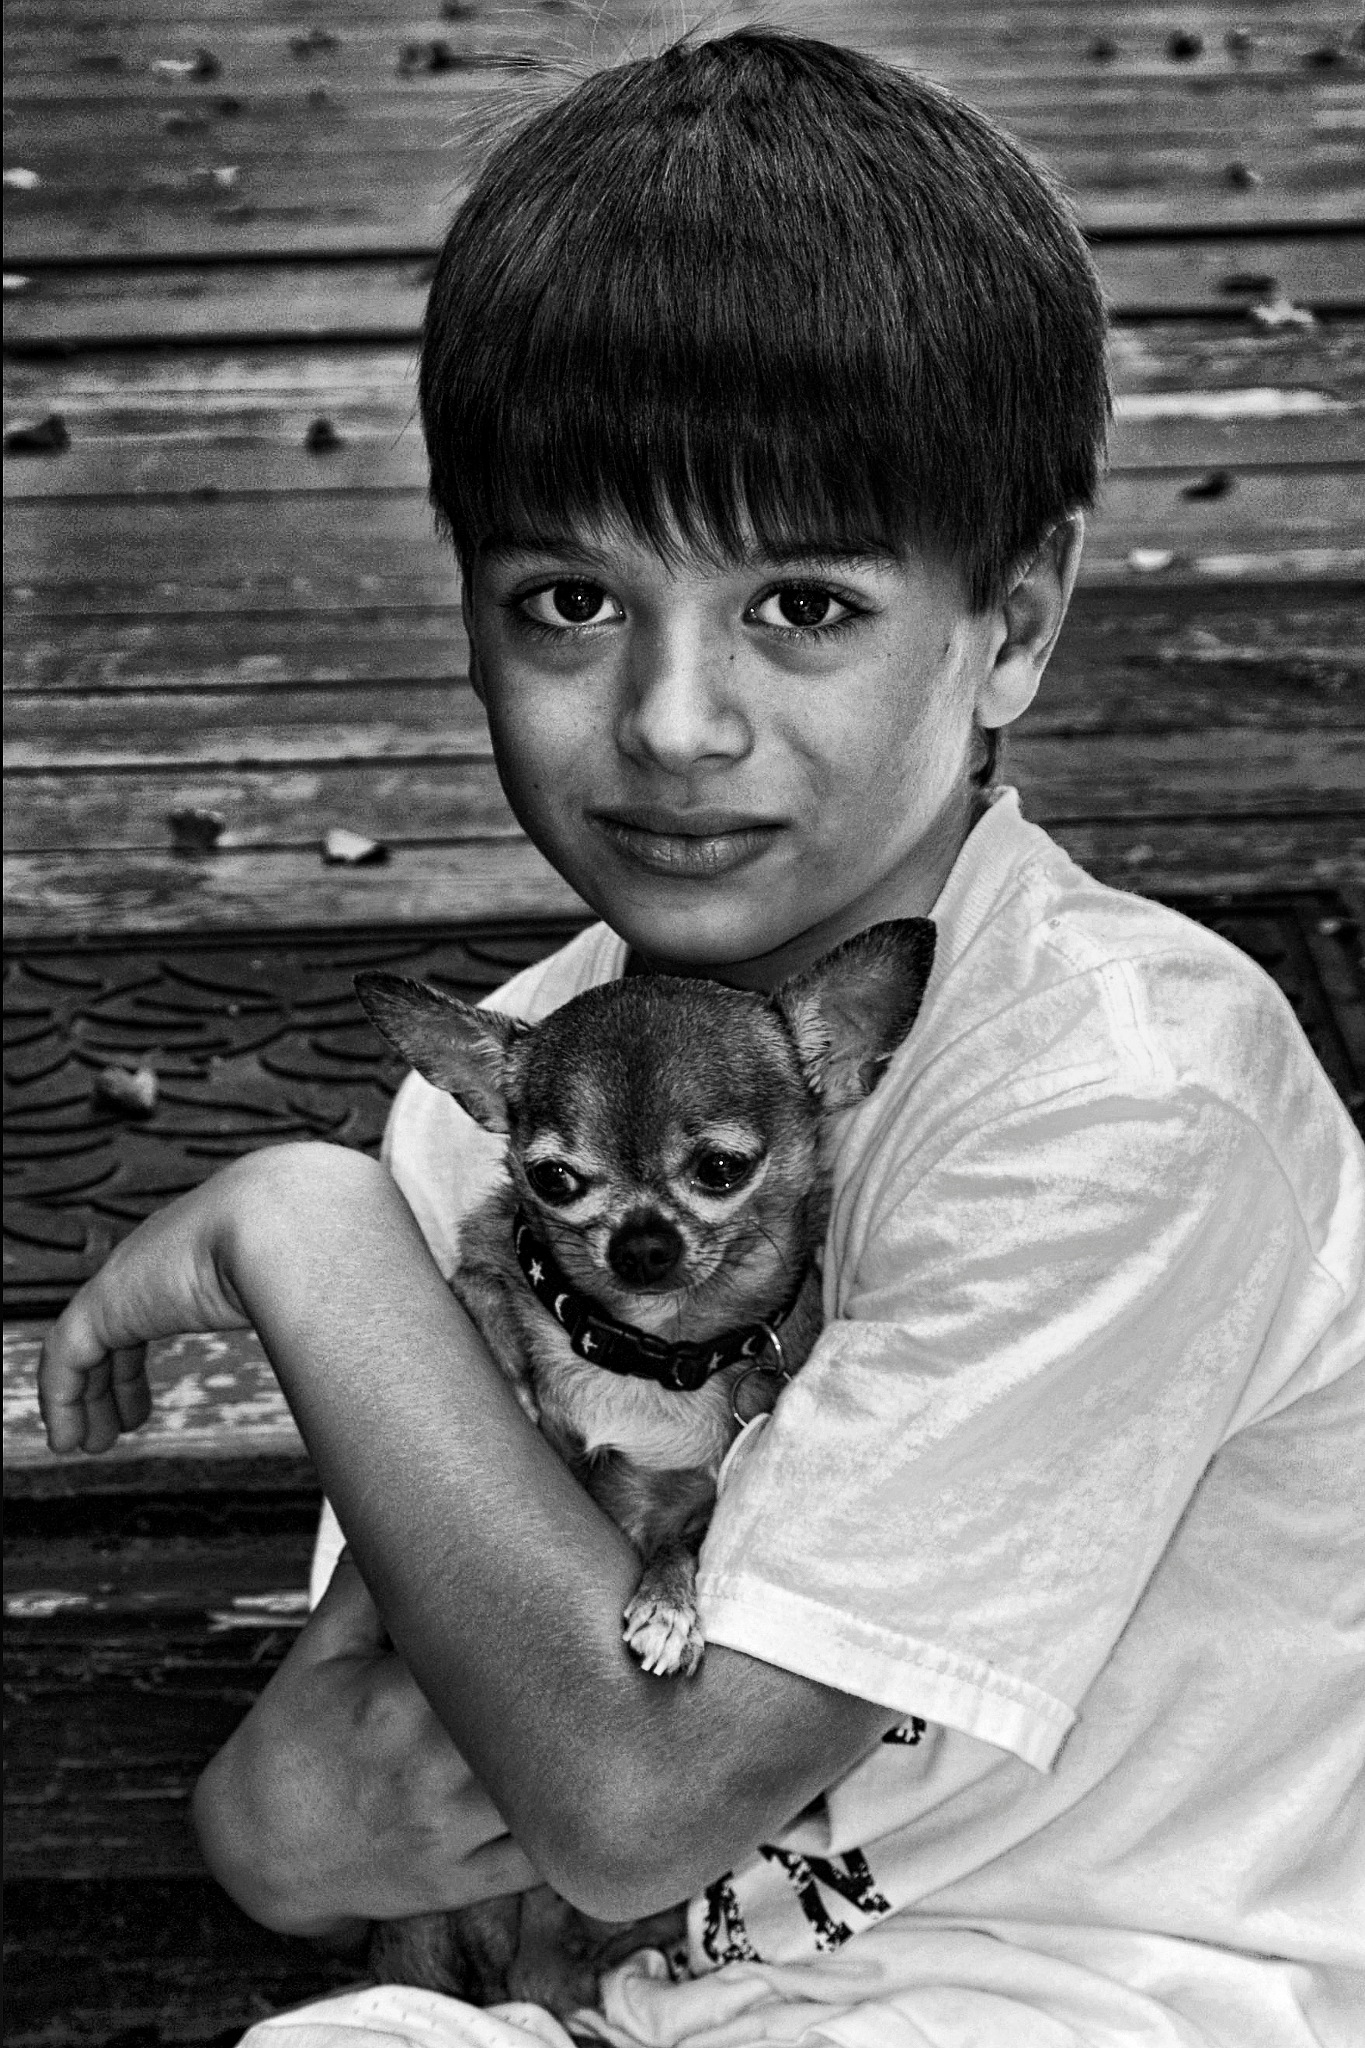 A boy and his dog by Joe Saladino